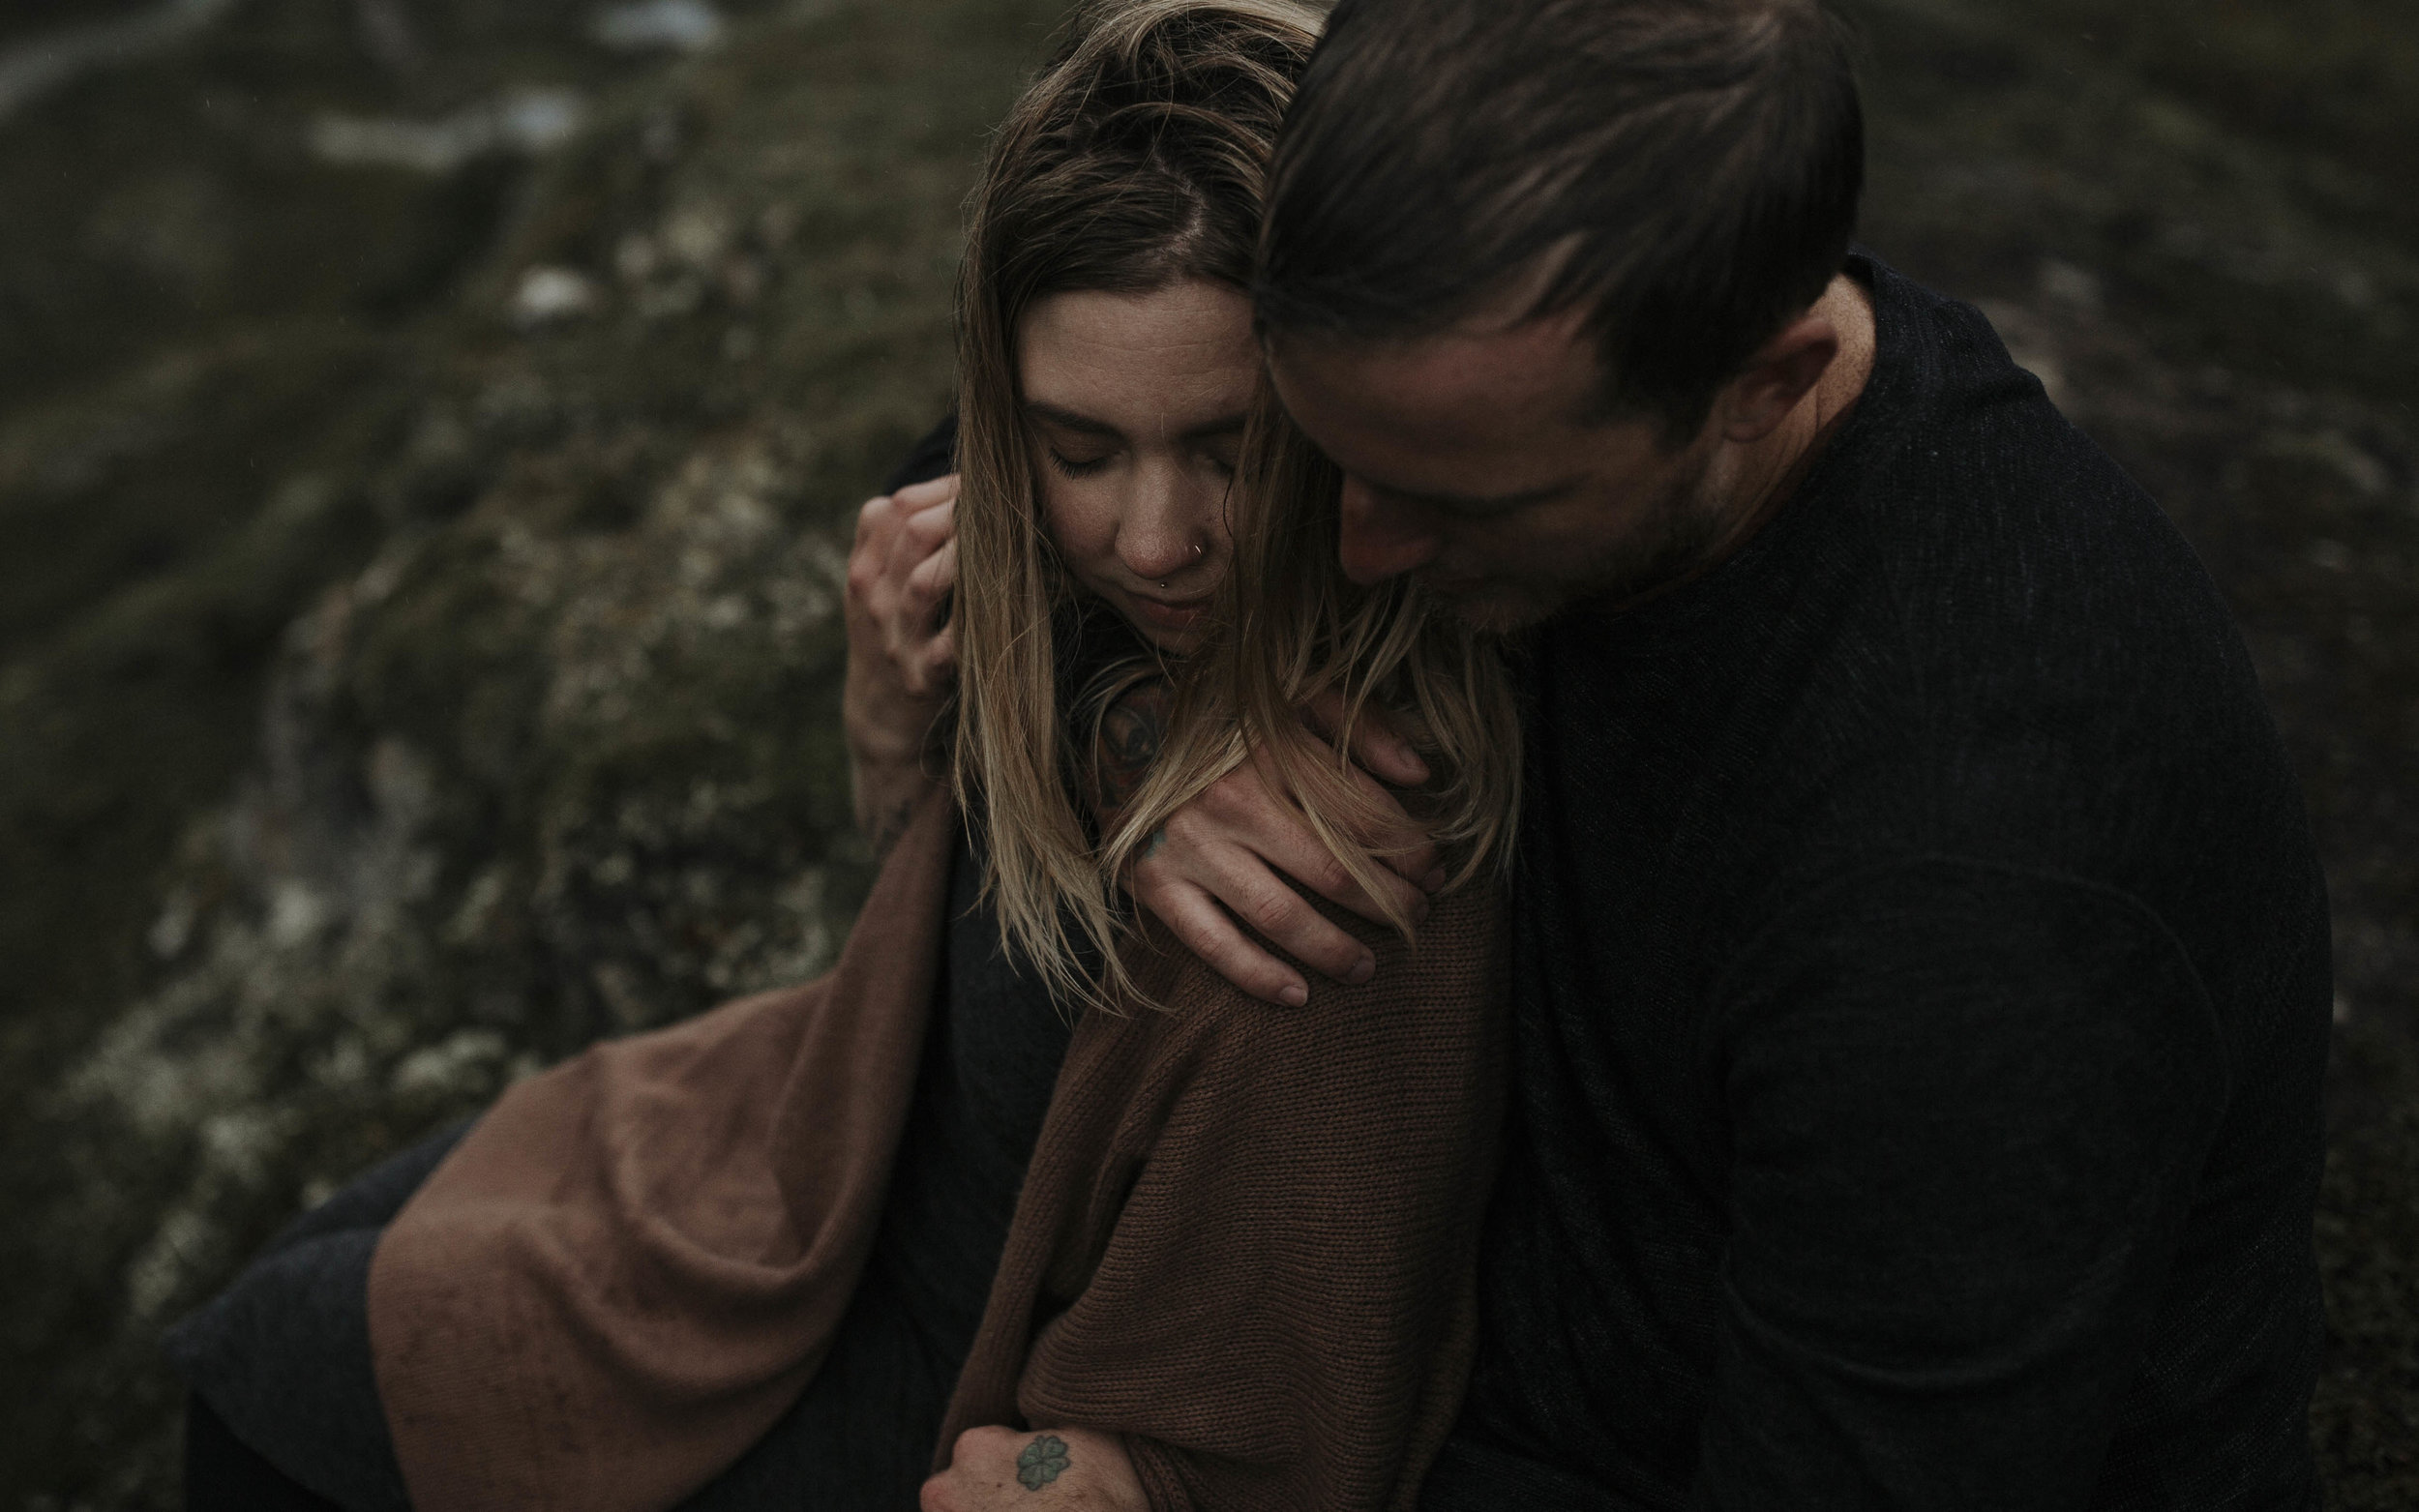 ariel-lynn-alaskan-mountain-couples-session-21.jpg